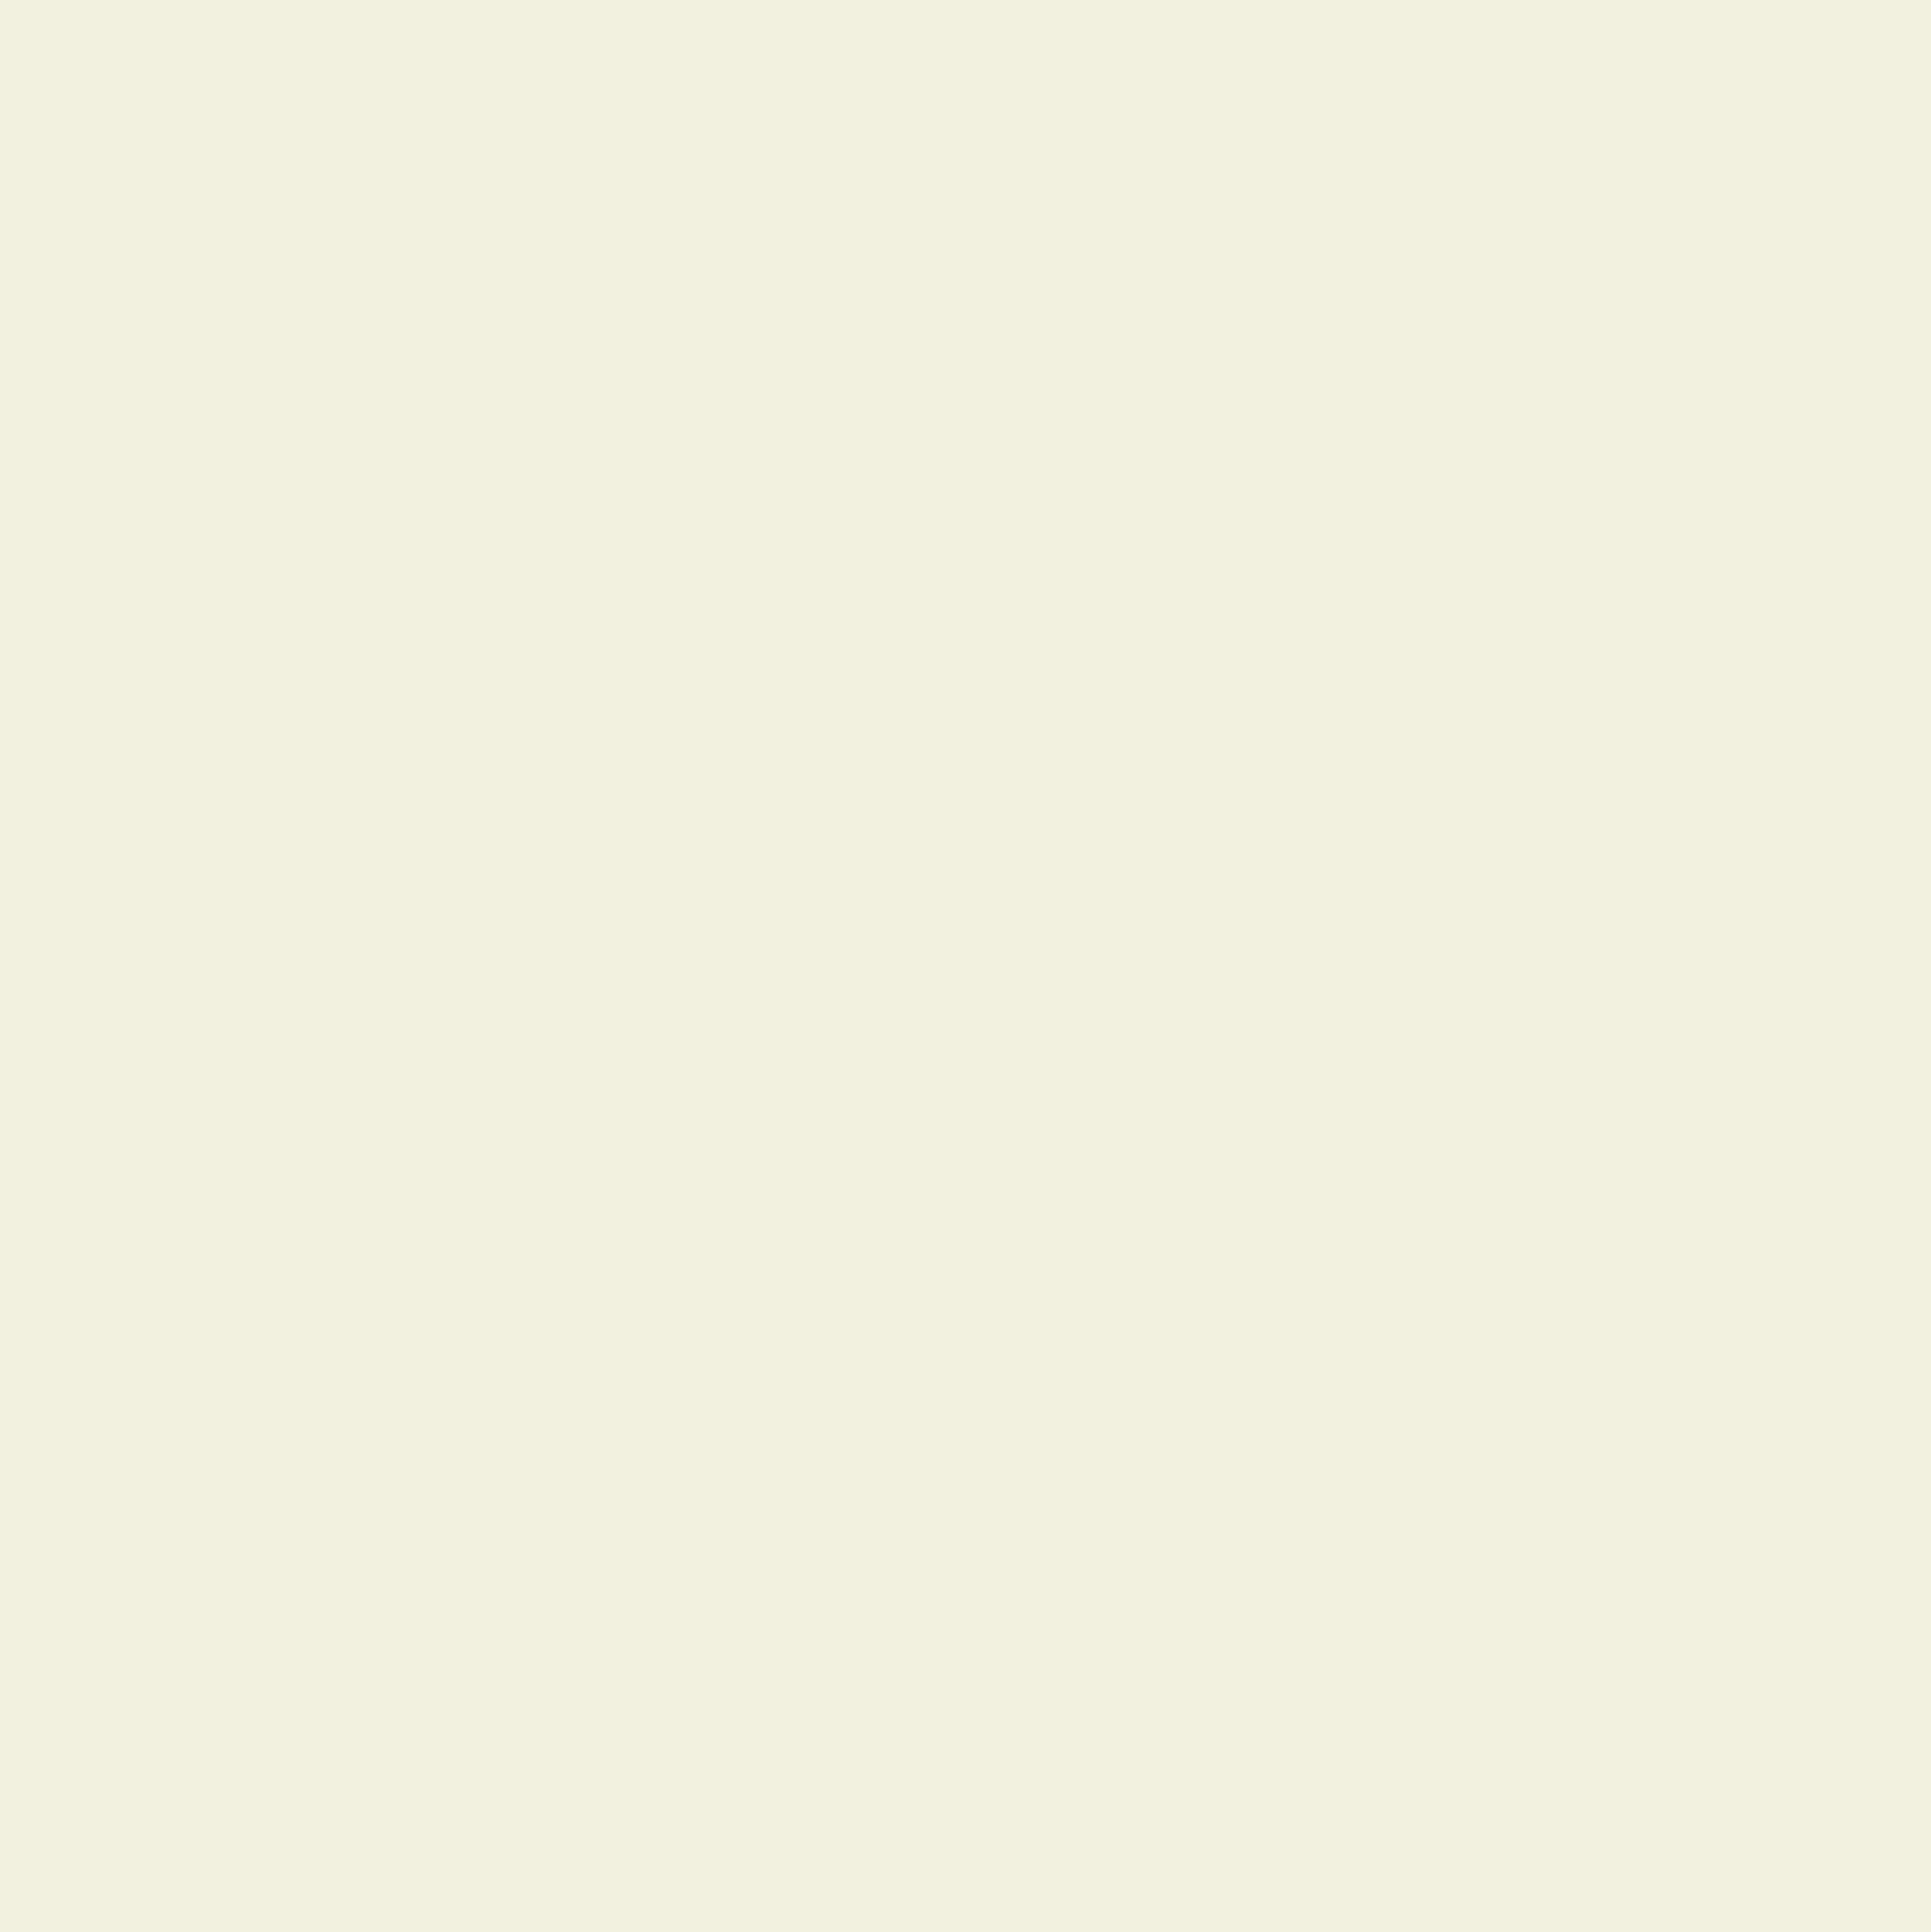 Mantel CRUDOColorLiso Rectangular 1,5x2,1m [enstockpara envíooretiro]